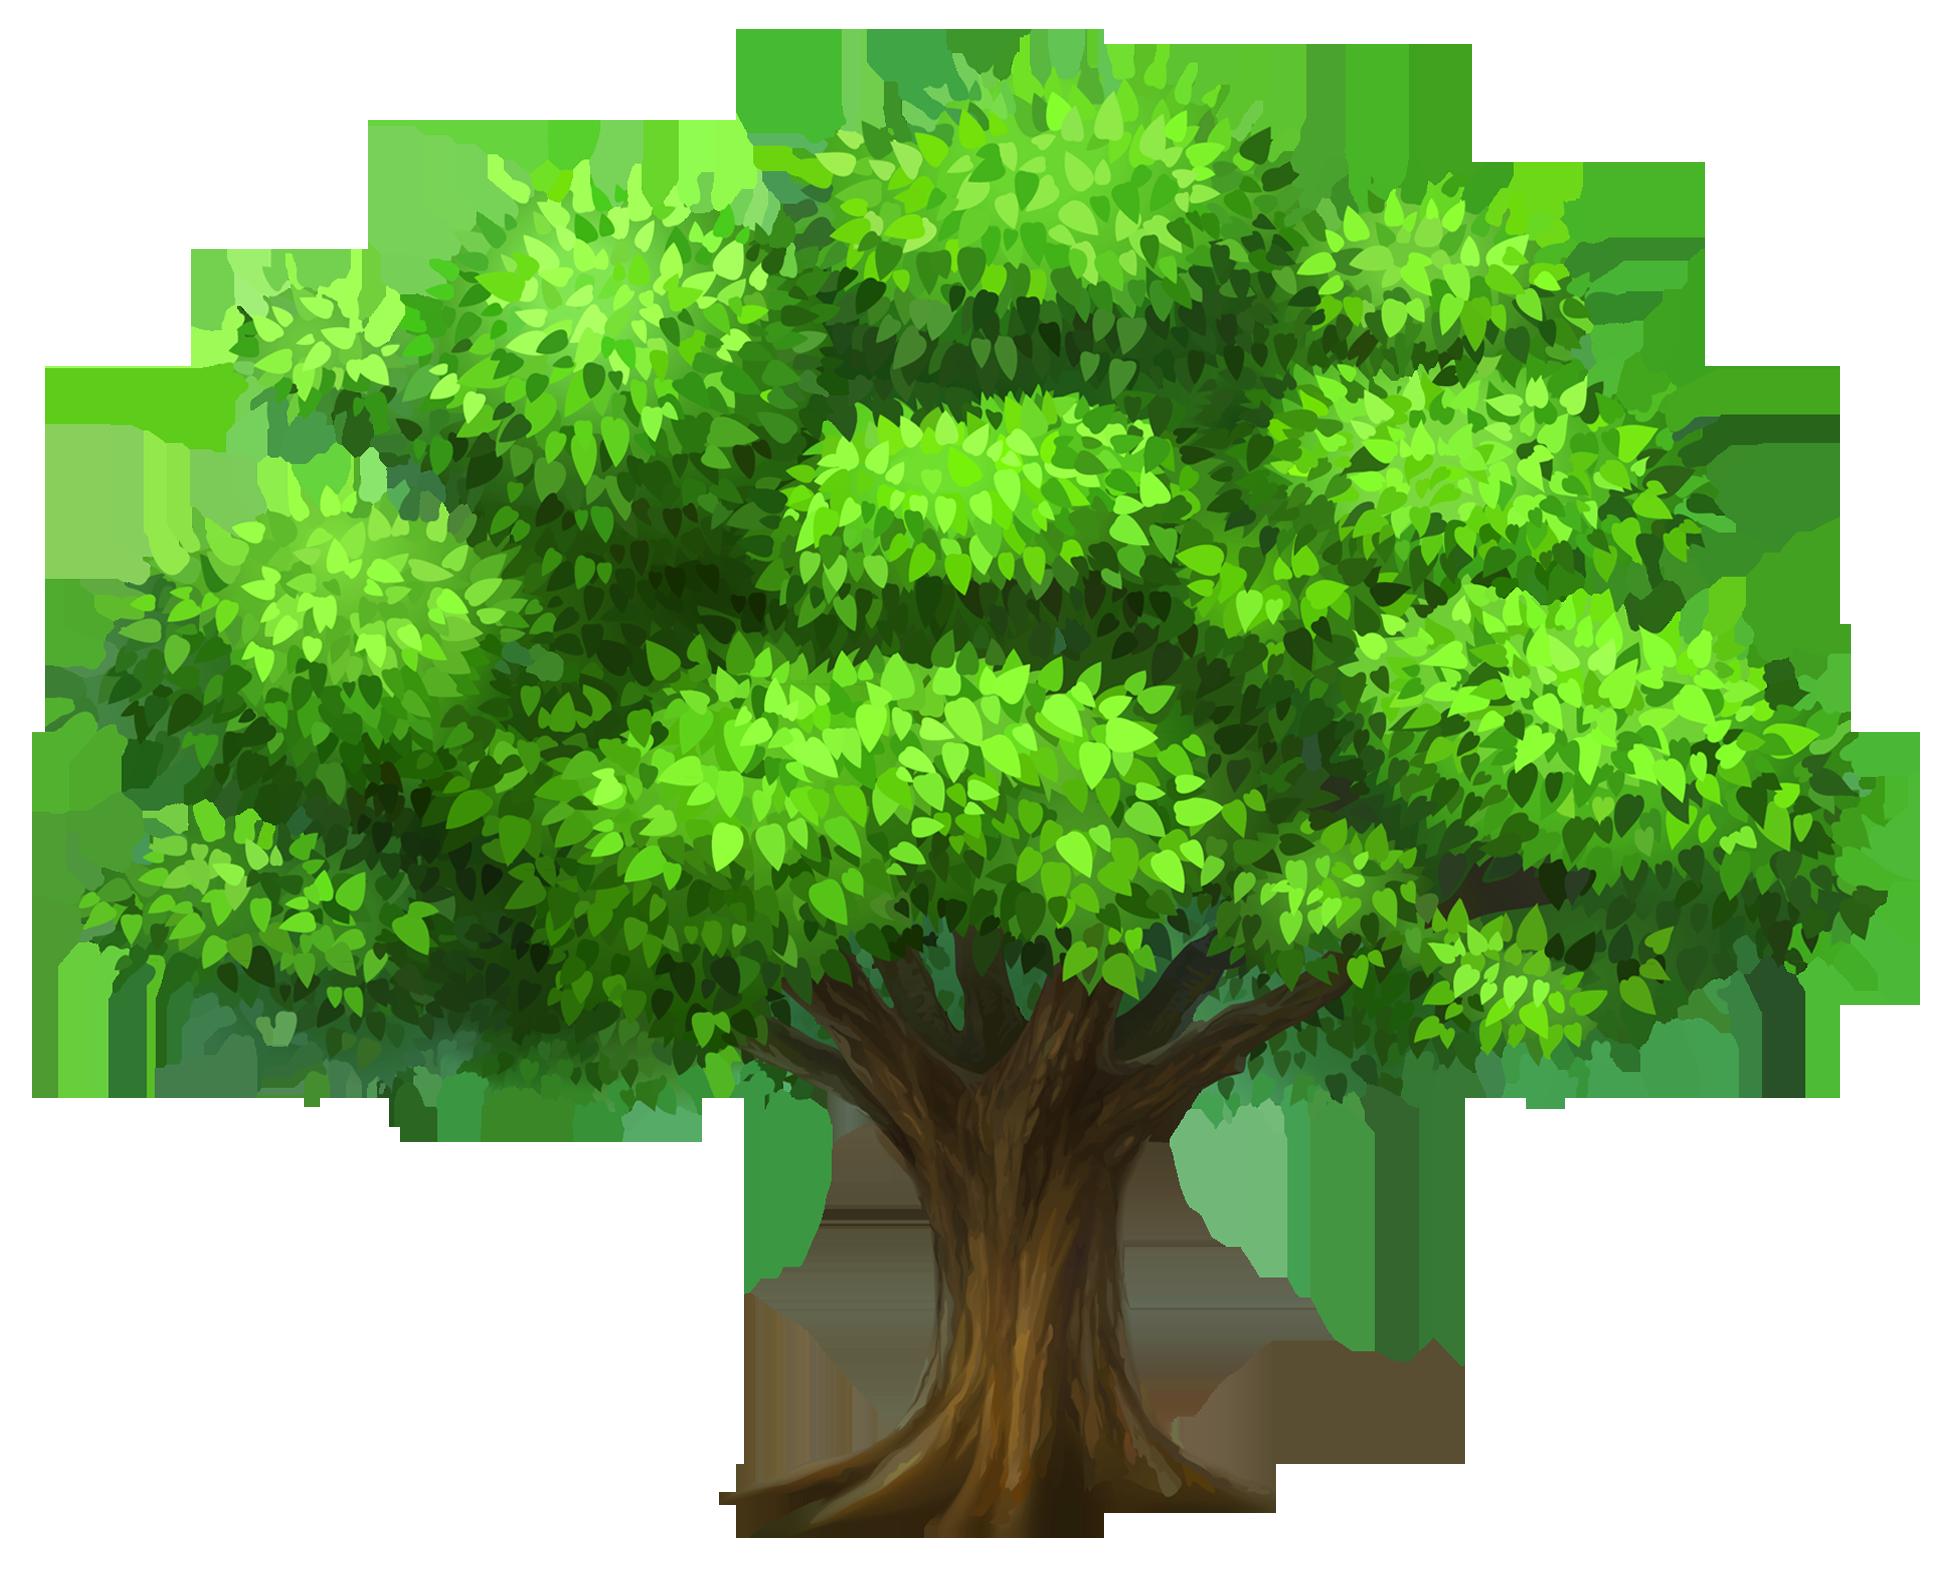 Bare Tree Clipart Free Clipart Image-Bare Tree Clipart Free Clipart Image-1